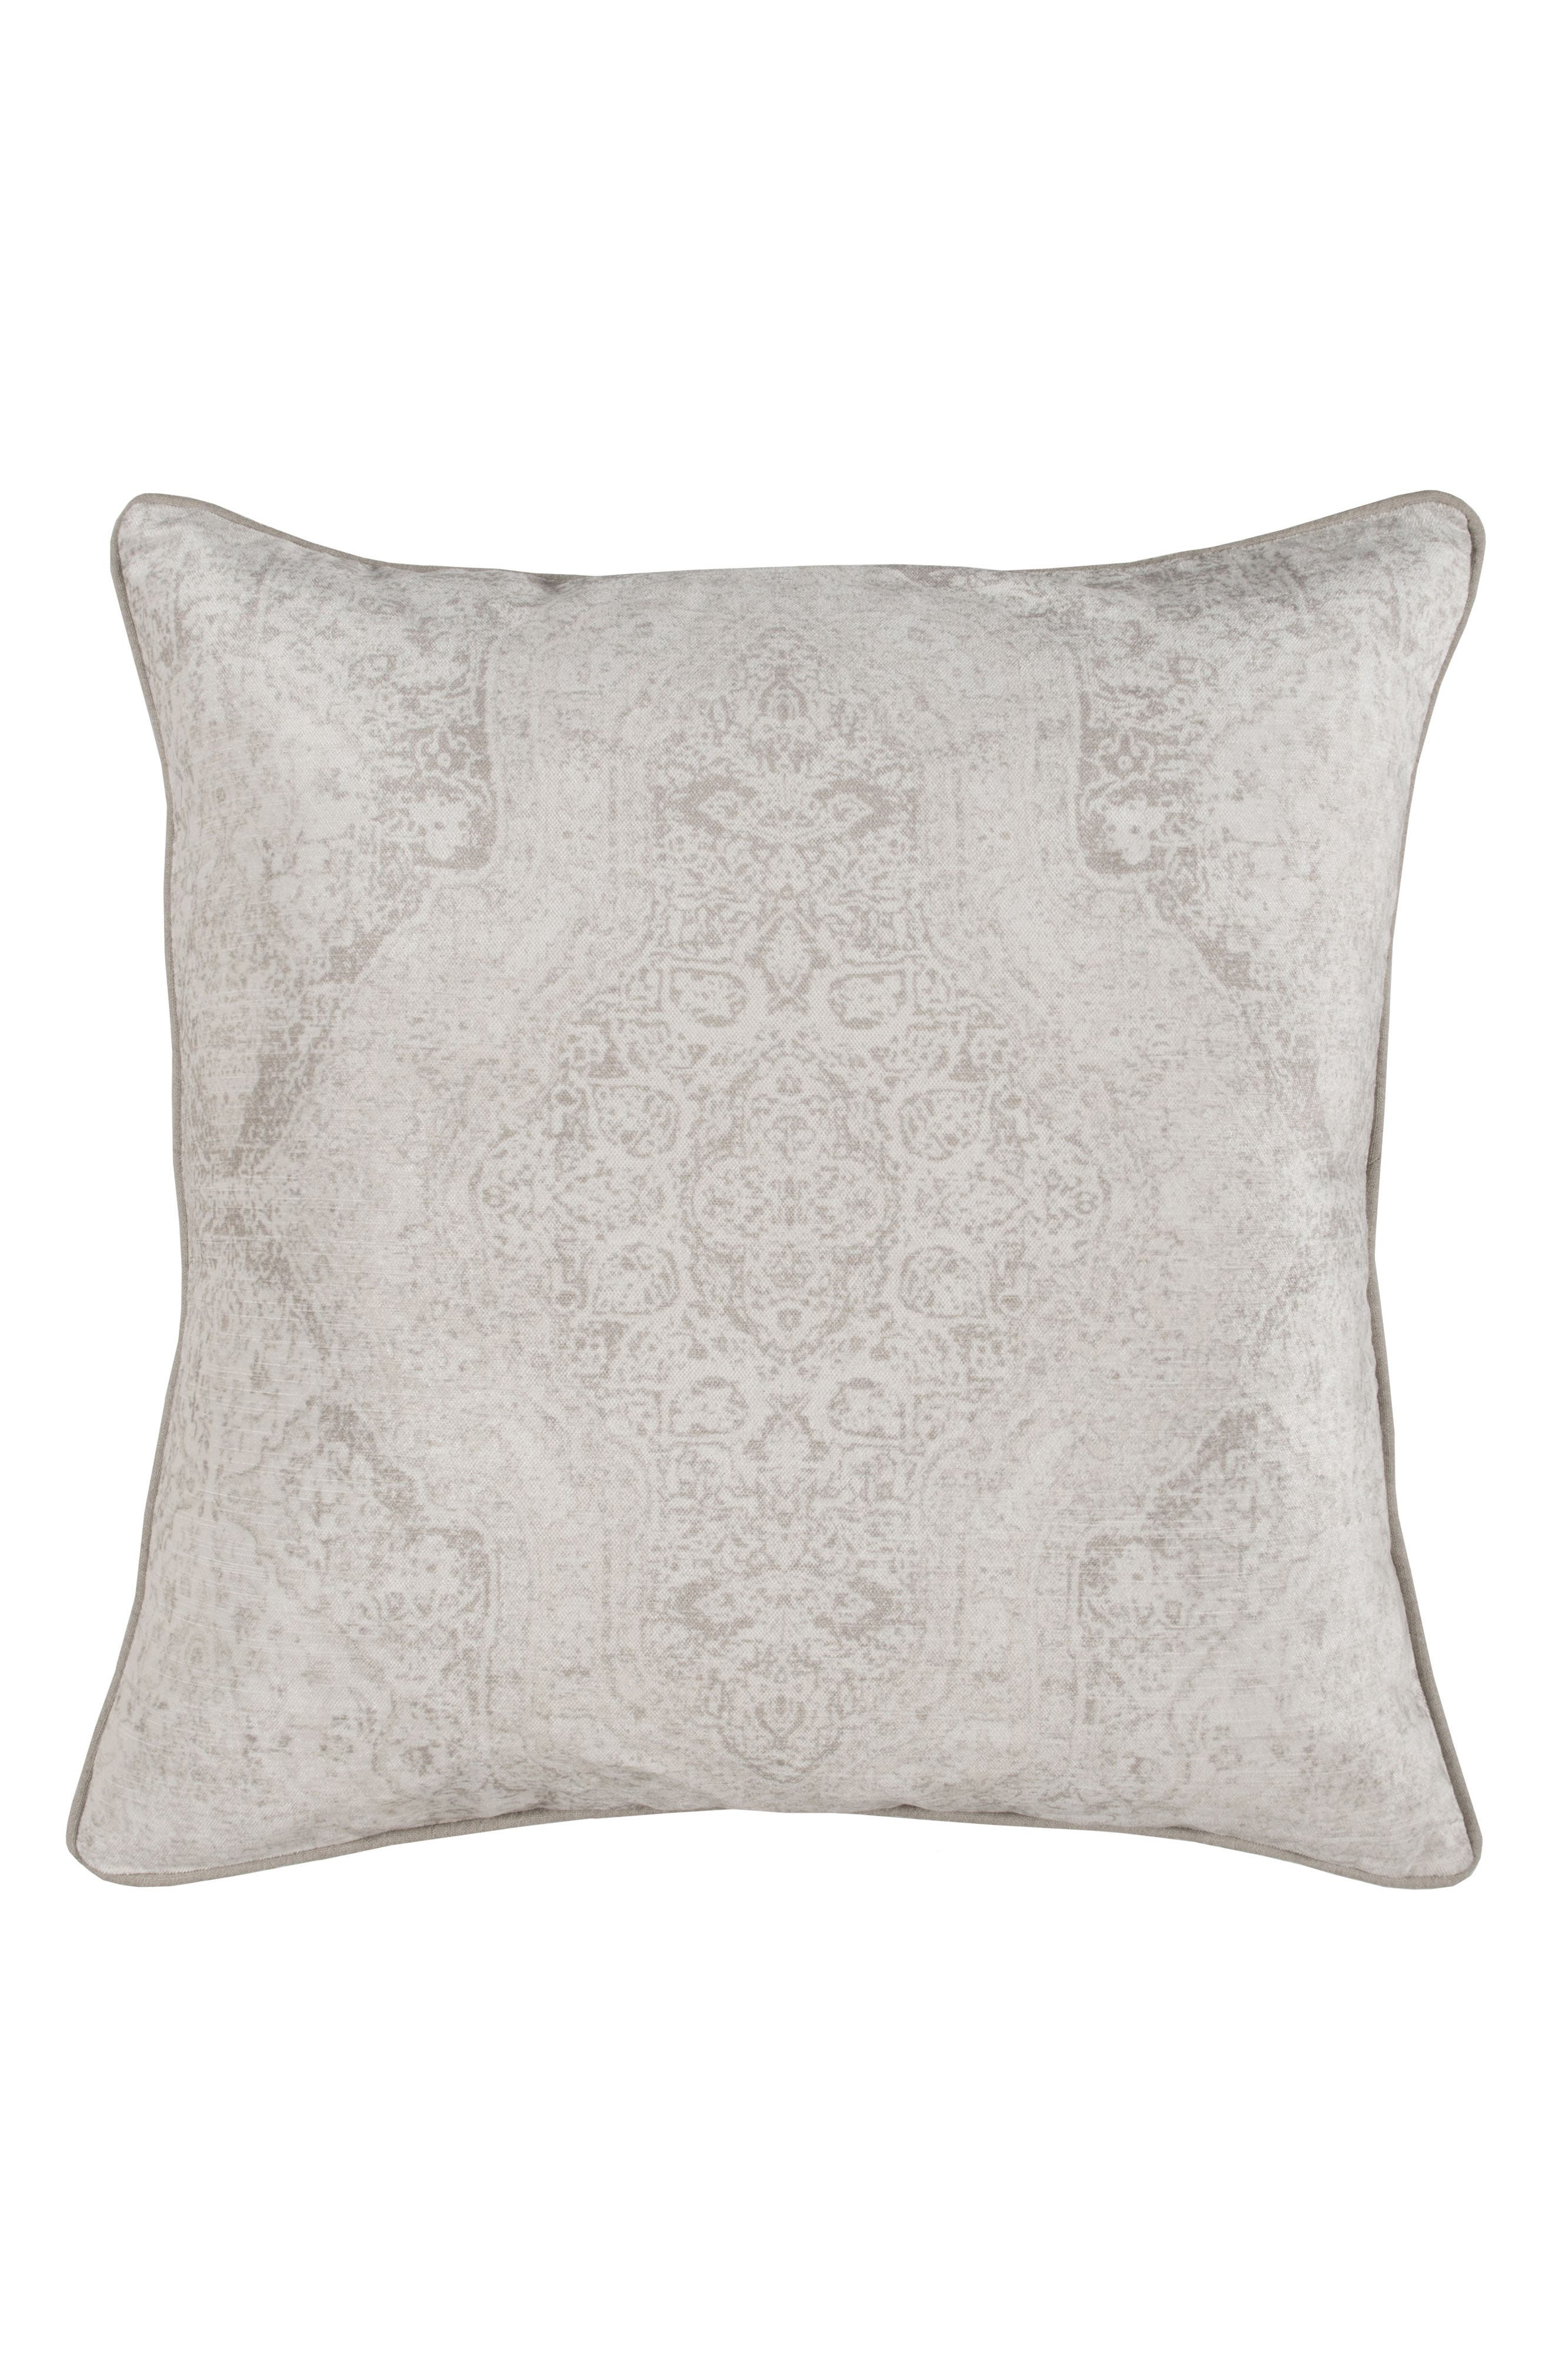 Luri Accent Pillow,                             Main thumbnail 1, color,                             250